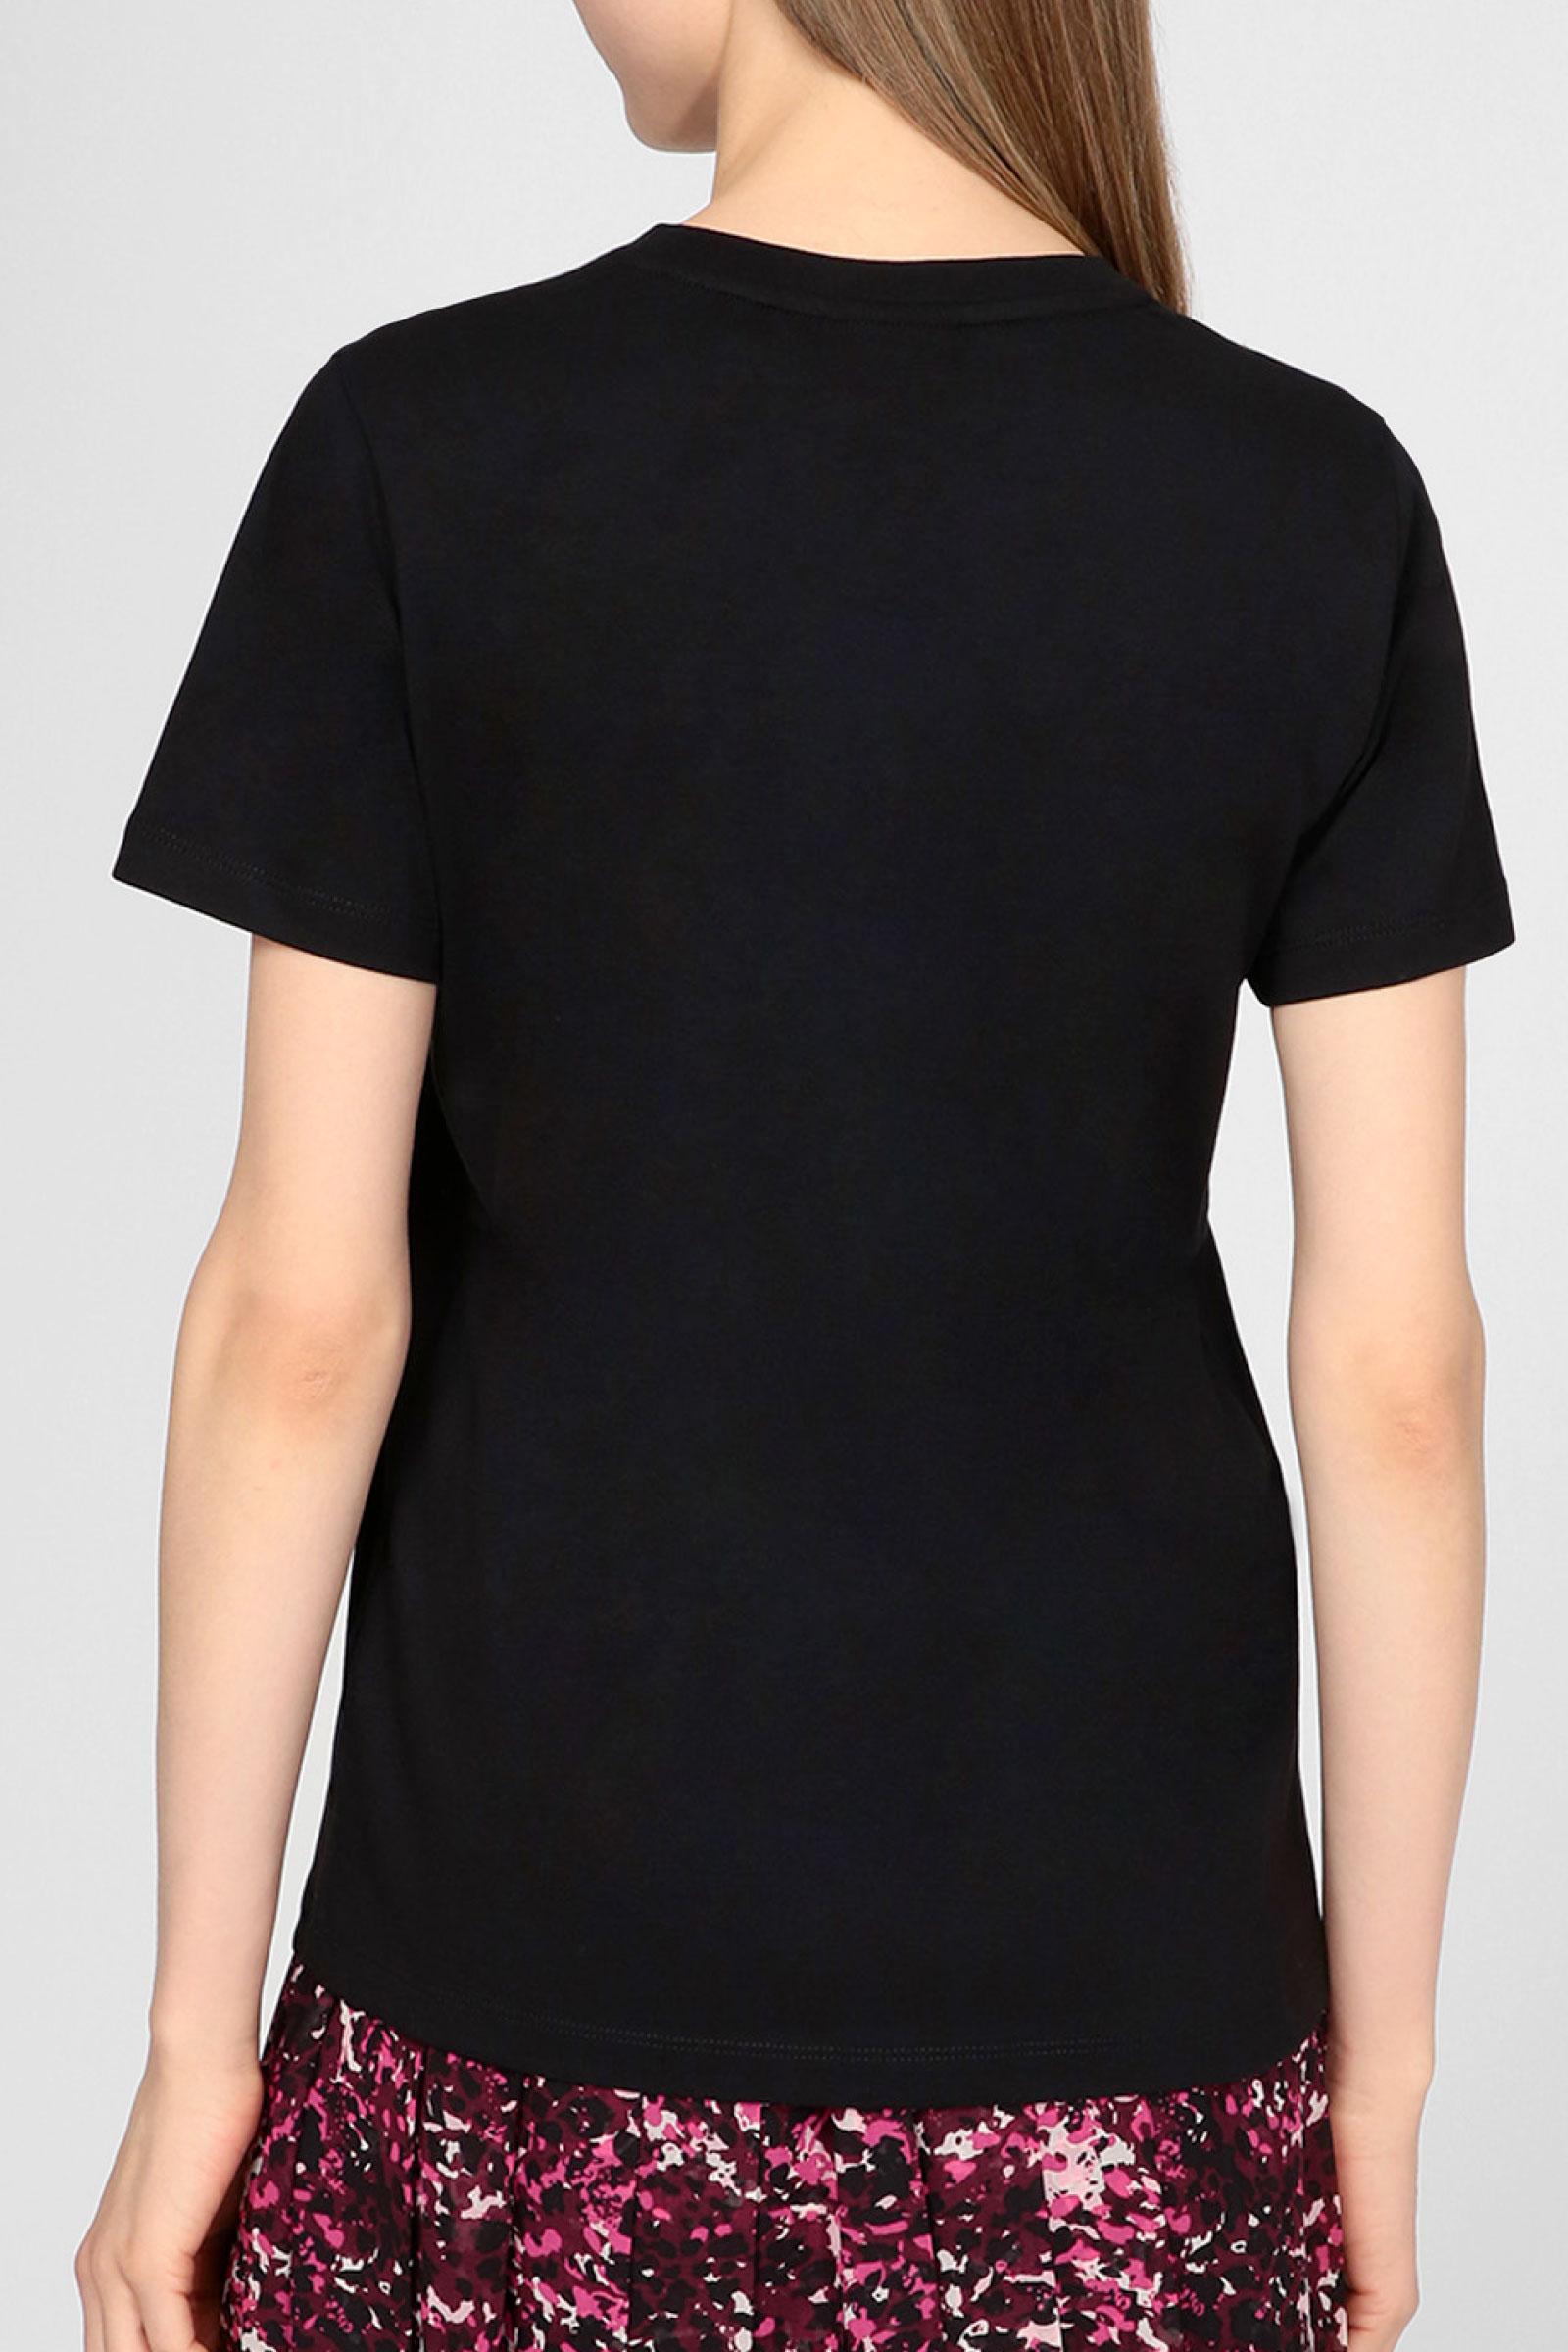 CALVIN KLEIN T-Shirt Donna CALVIN KLEIN   T-Shirt   K20K202018BDS